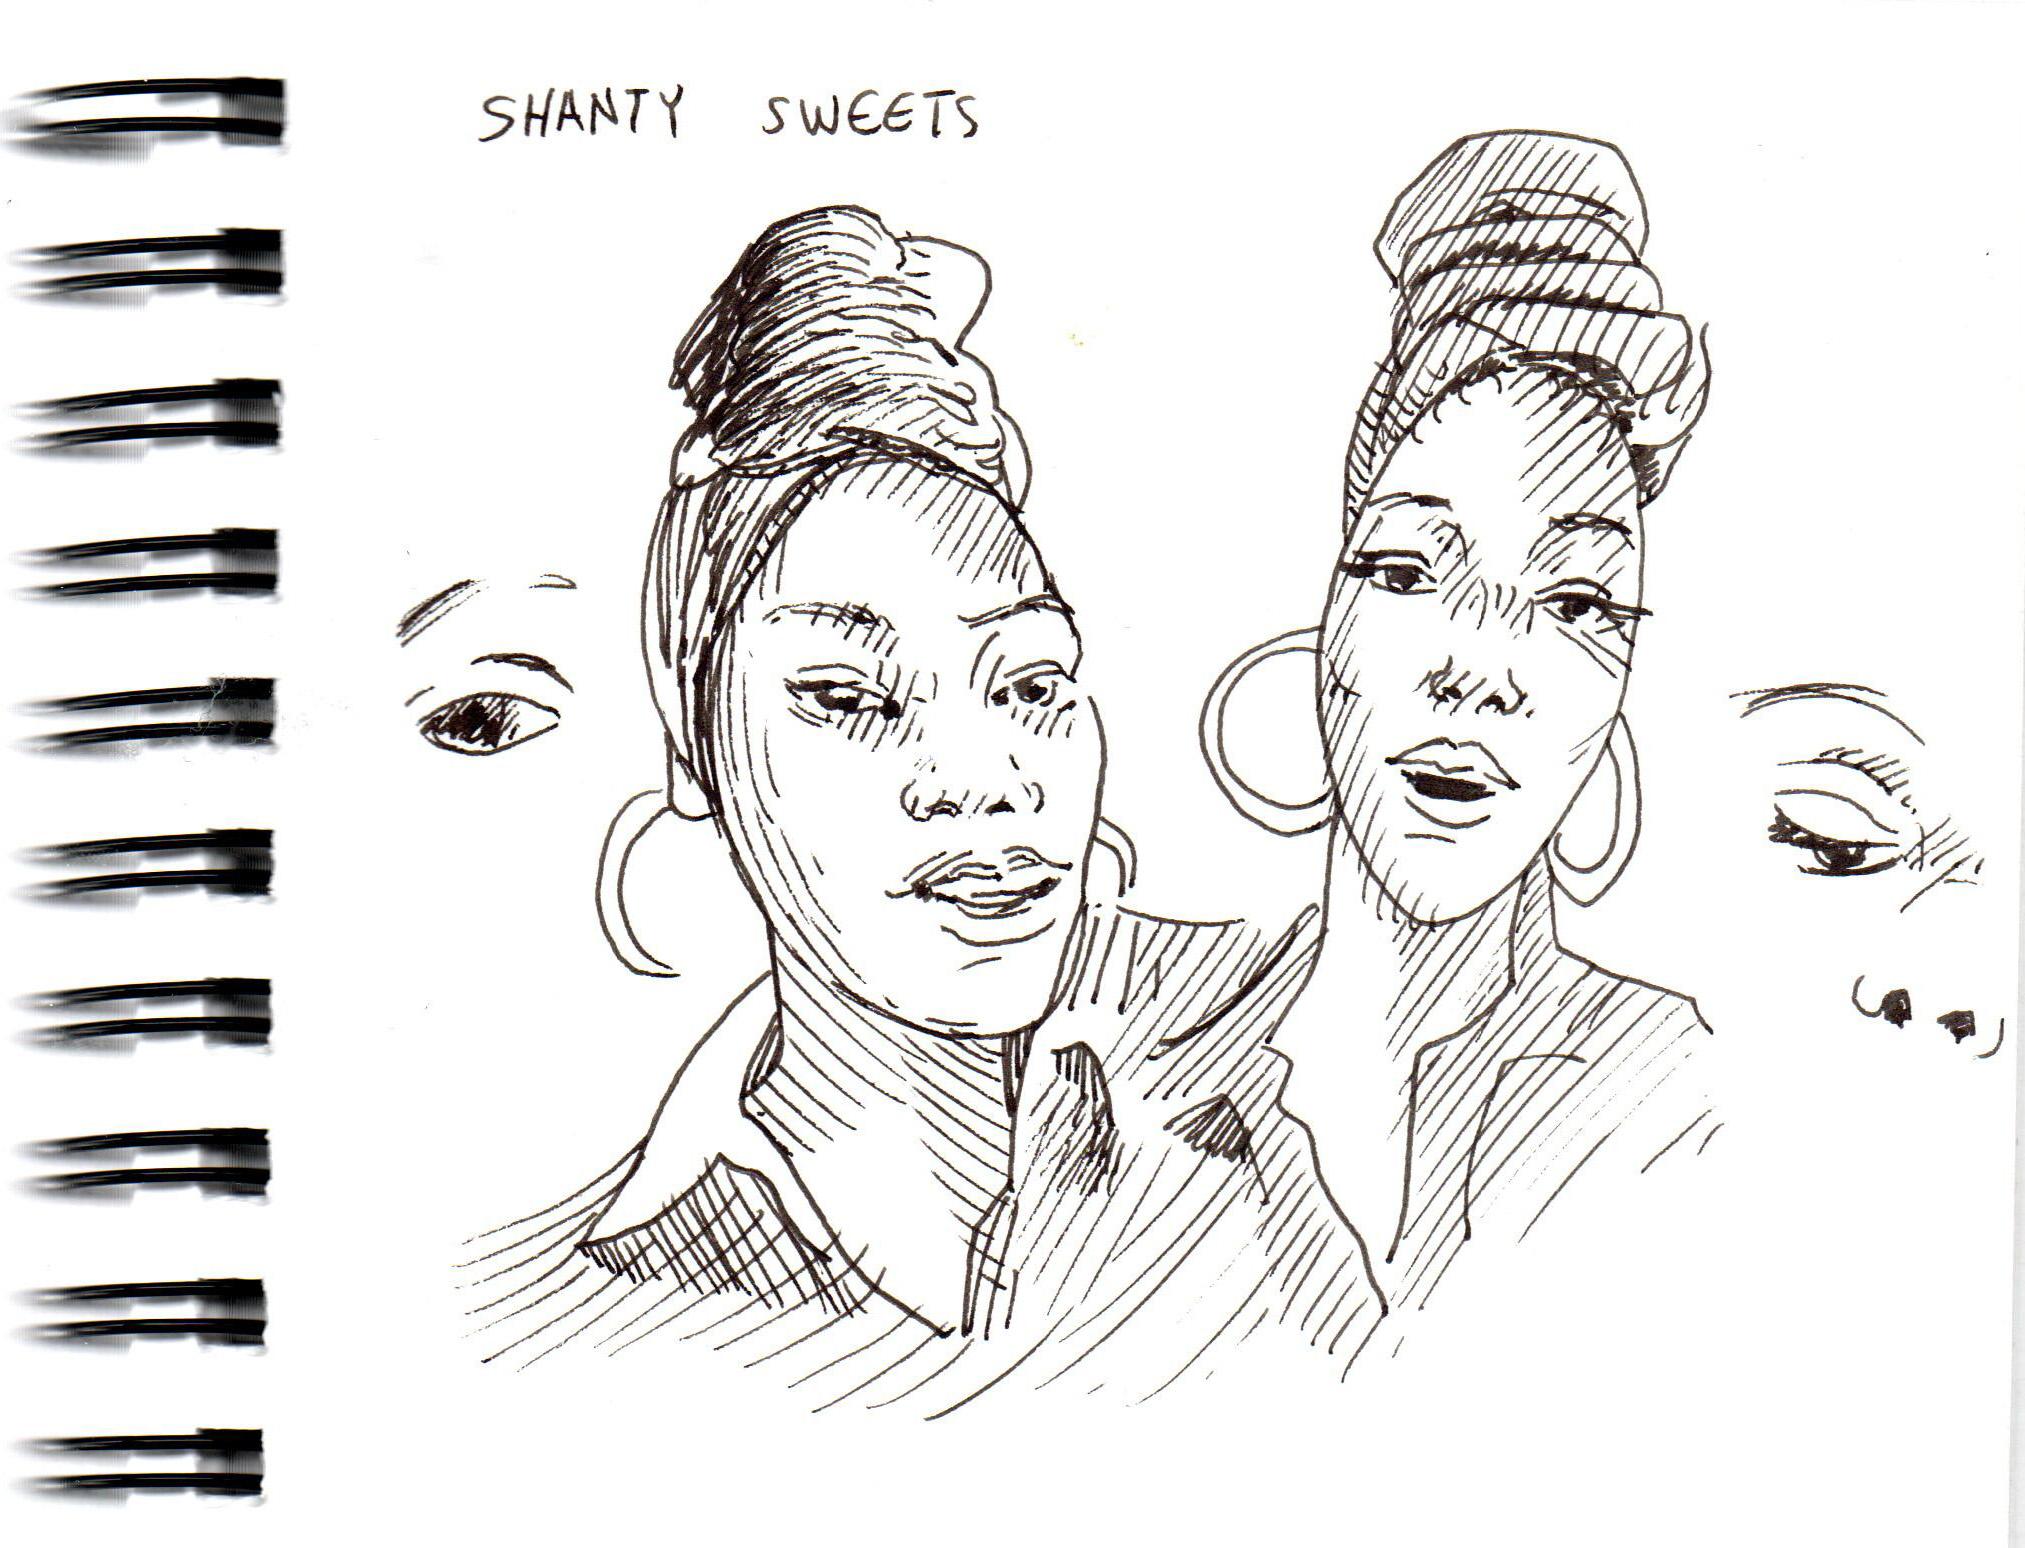 Shanty Sweets